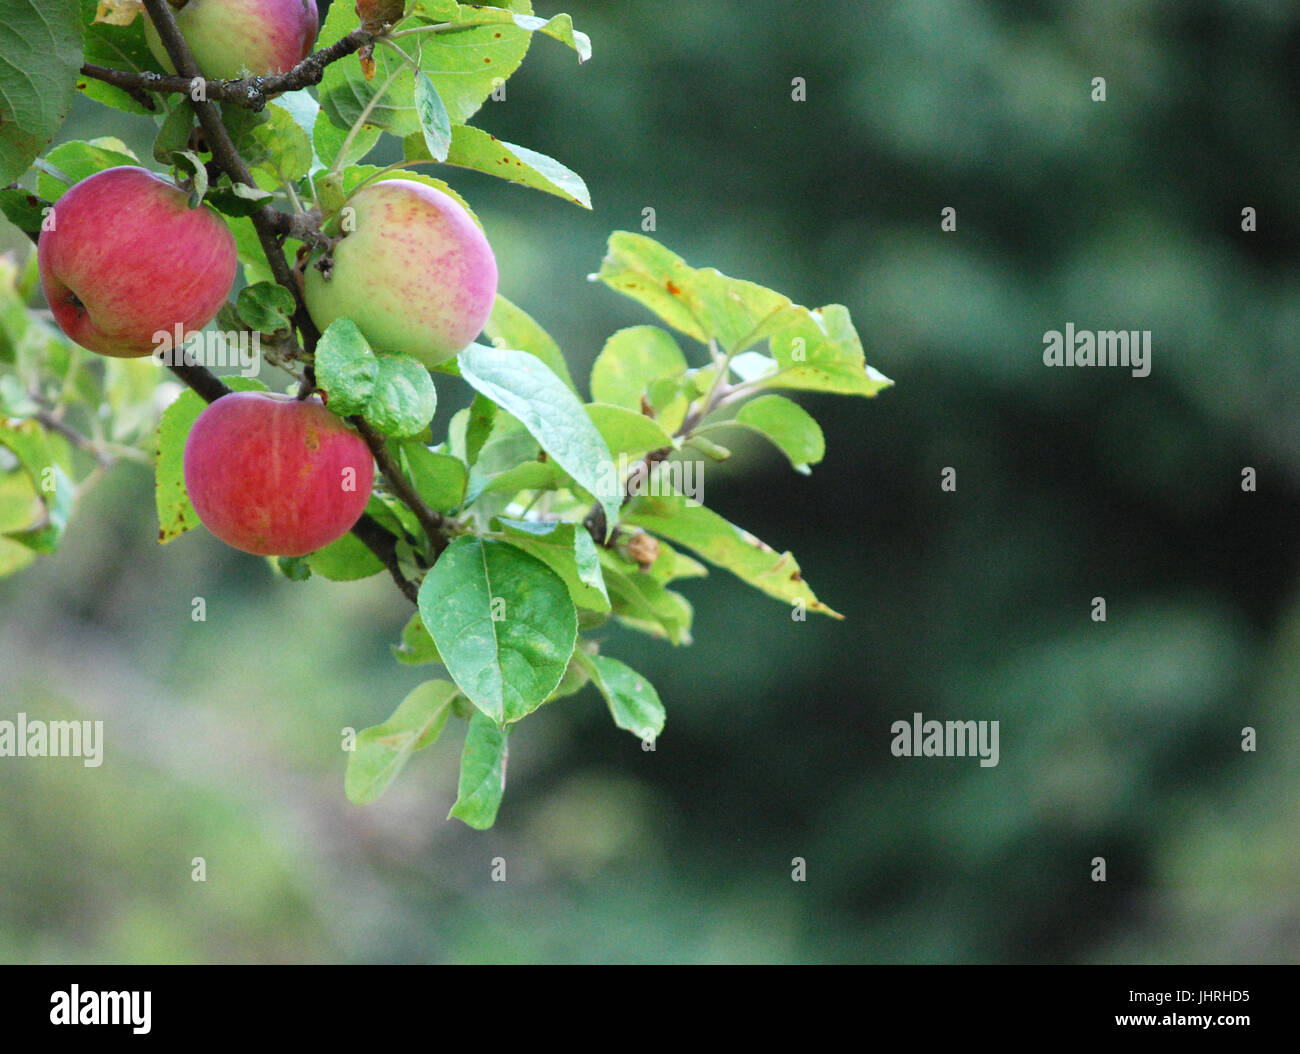 Apple Trees in the orchard at Johnson Farm, Bainbridge Island, WA. USA - Stock Image